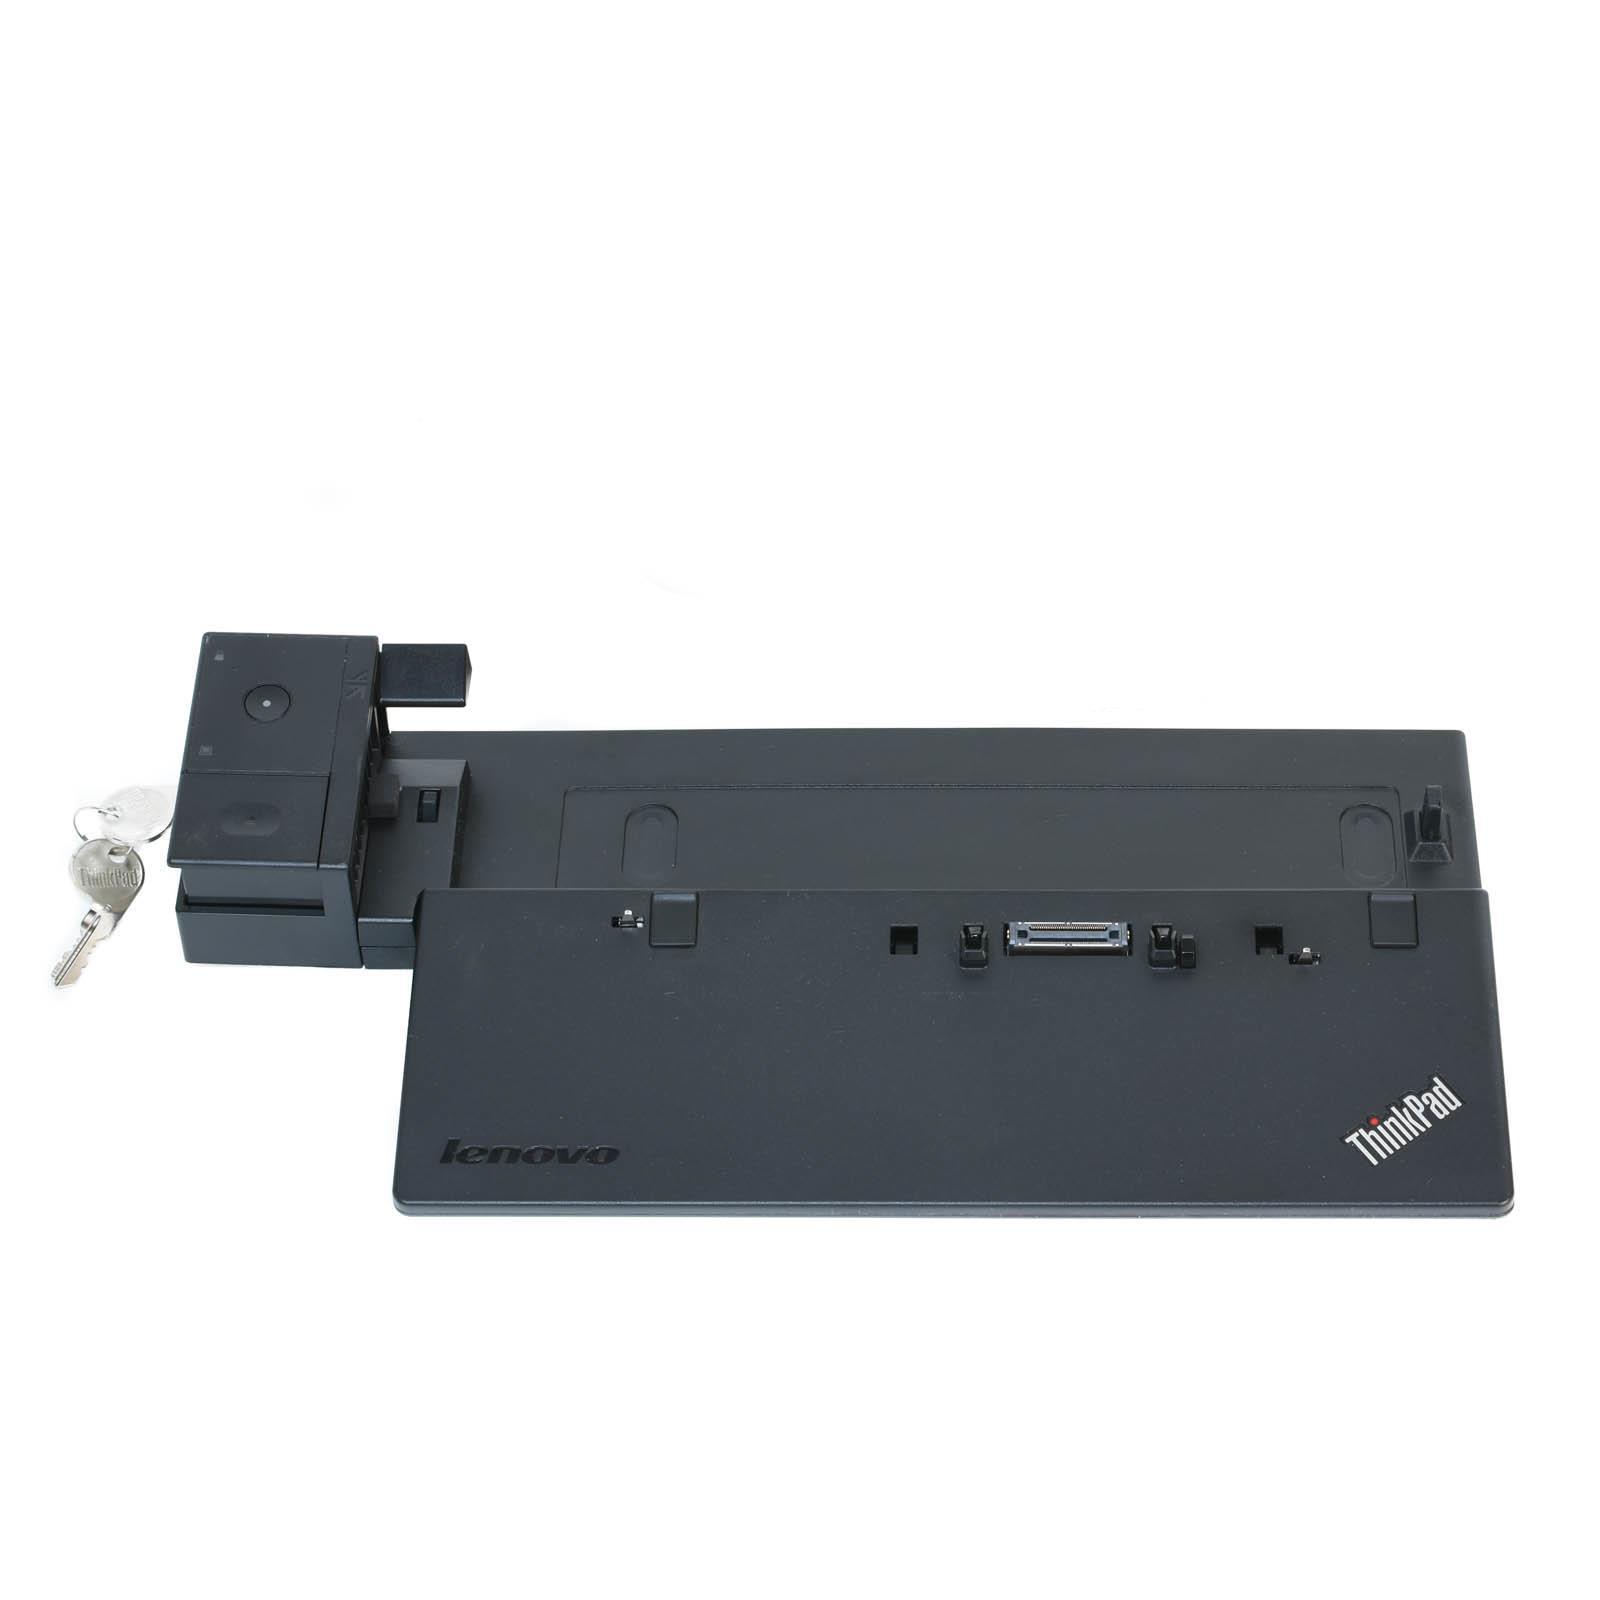 Lenovo ThinkPad Pro Dock Type 40A1 T440 T450 T540P T460 T470 X240